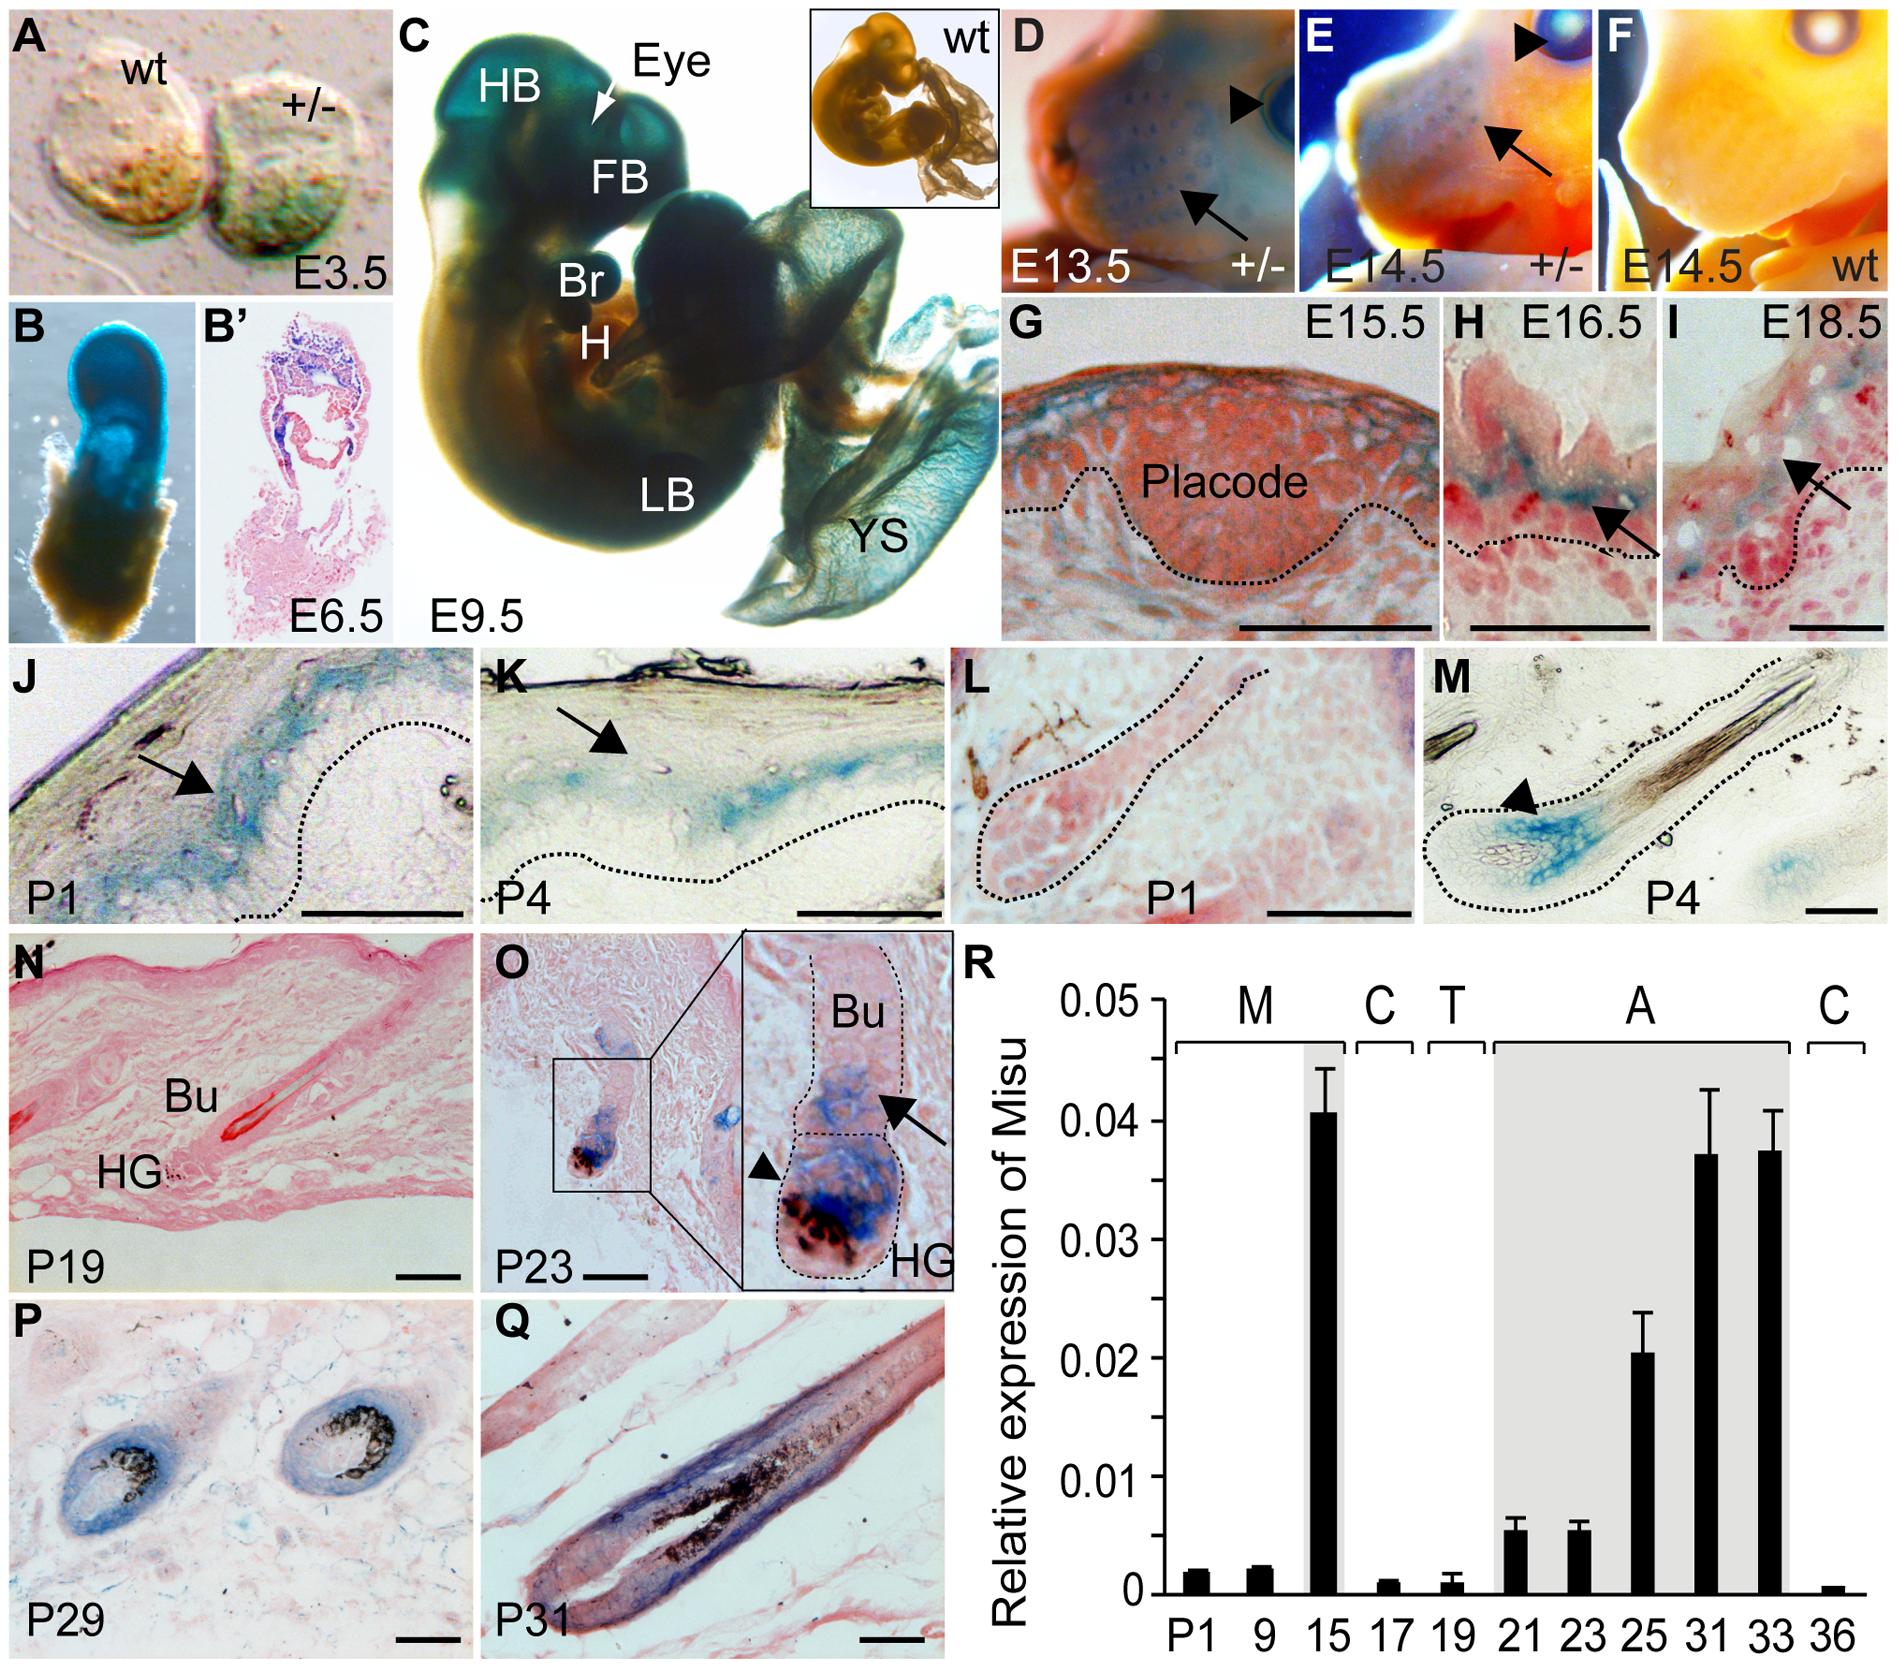 Expression of Misu during embryogenesis, skin morphogenesis, and in adult epidermis.